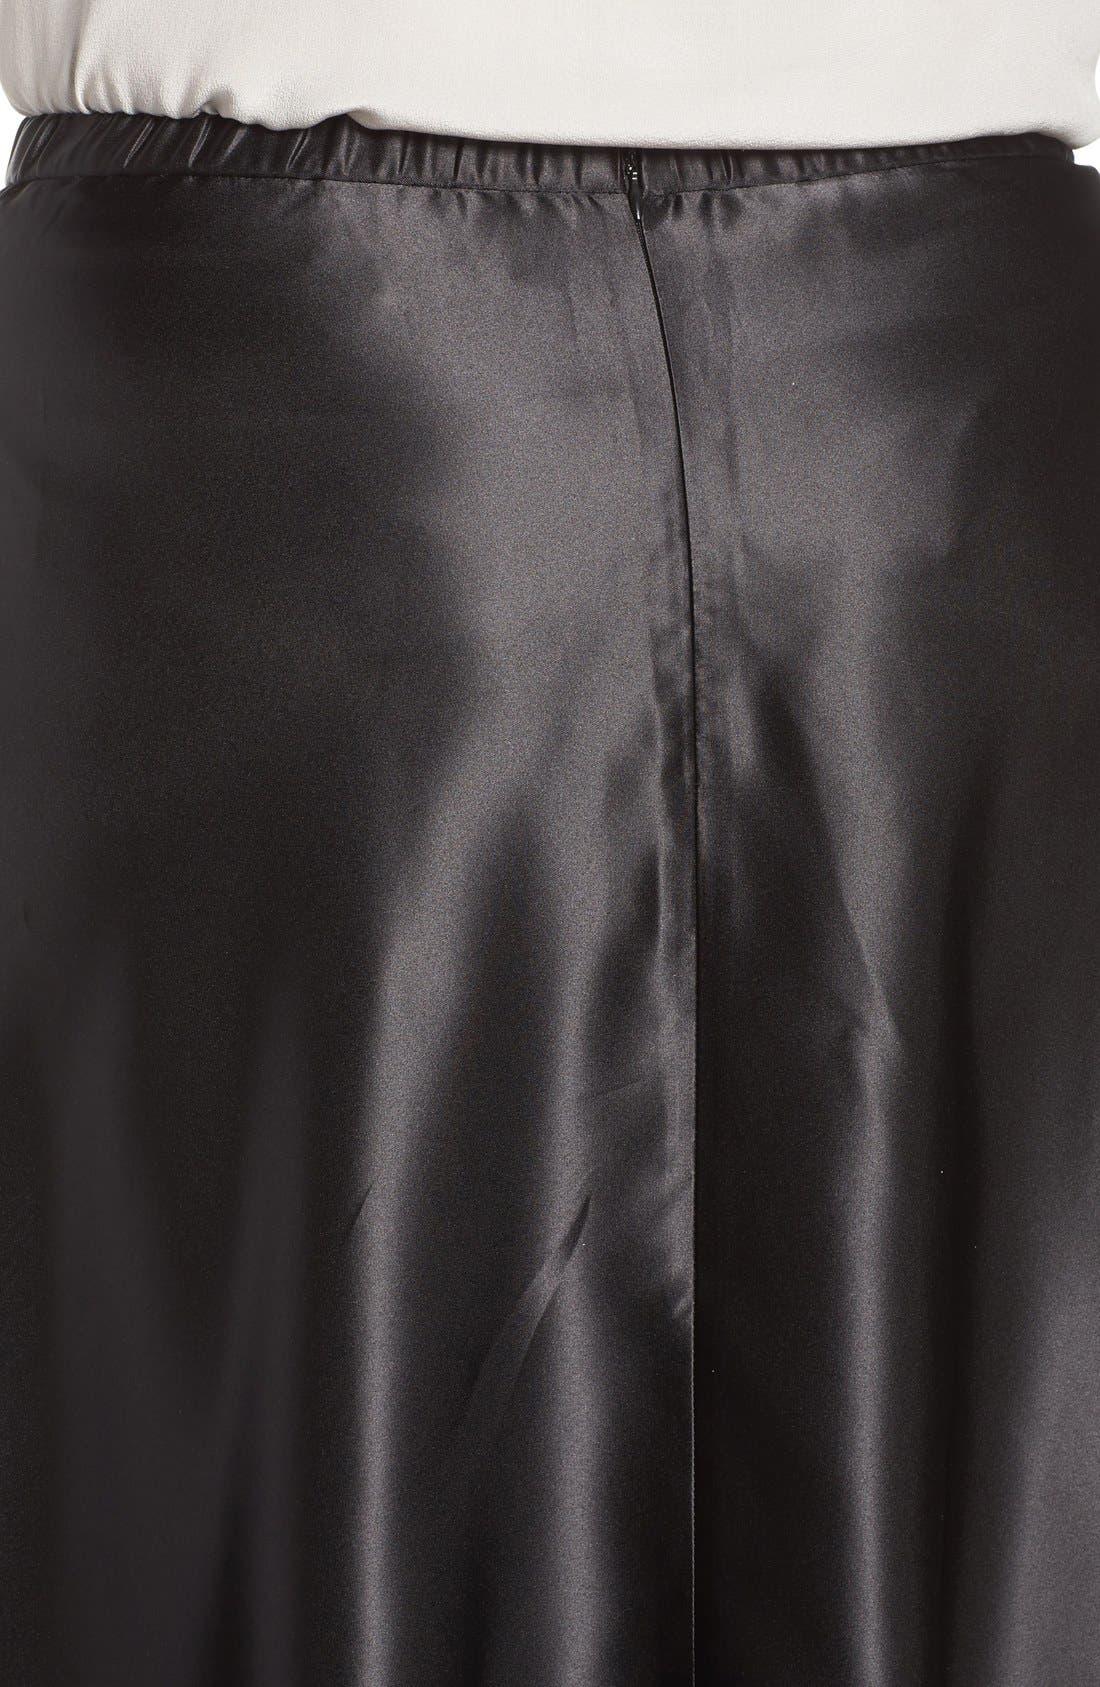 Satin Long Circle Skirt,                             Alternate thumbnail 5, color,                             001